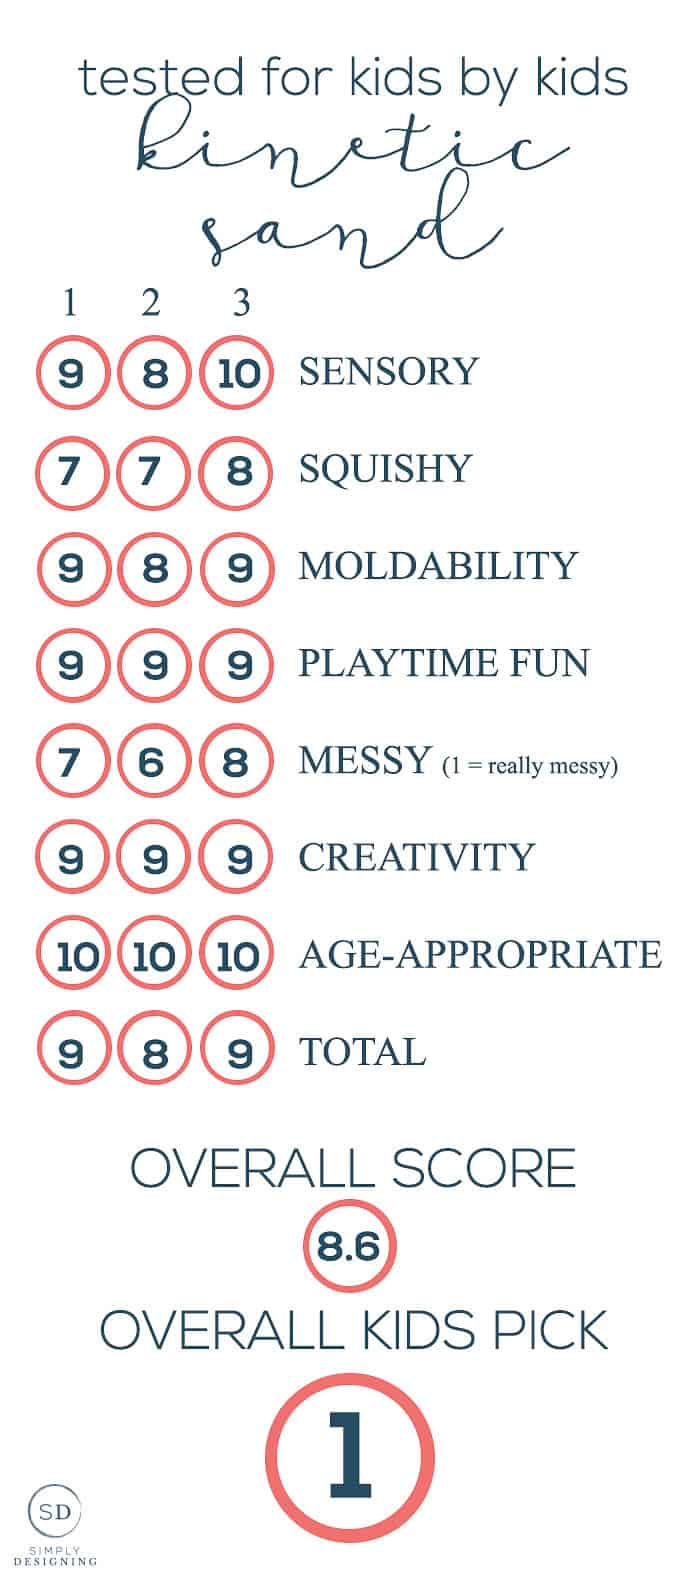 tested by kids for kids - sensory sand throwdown - kinetic sand ratings